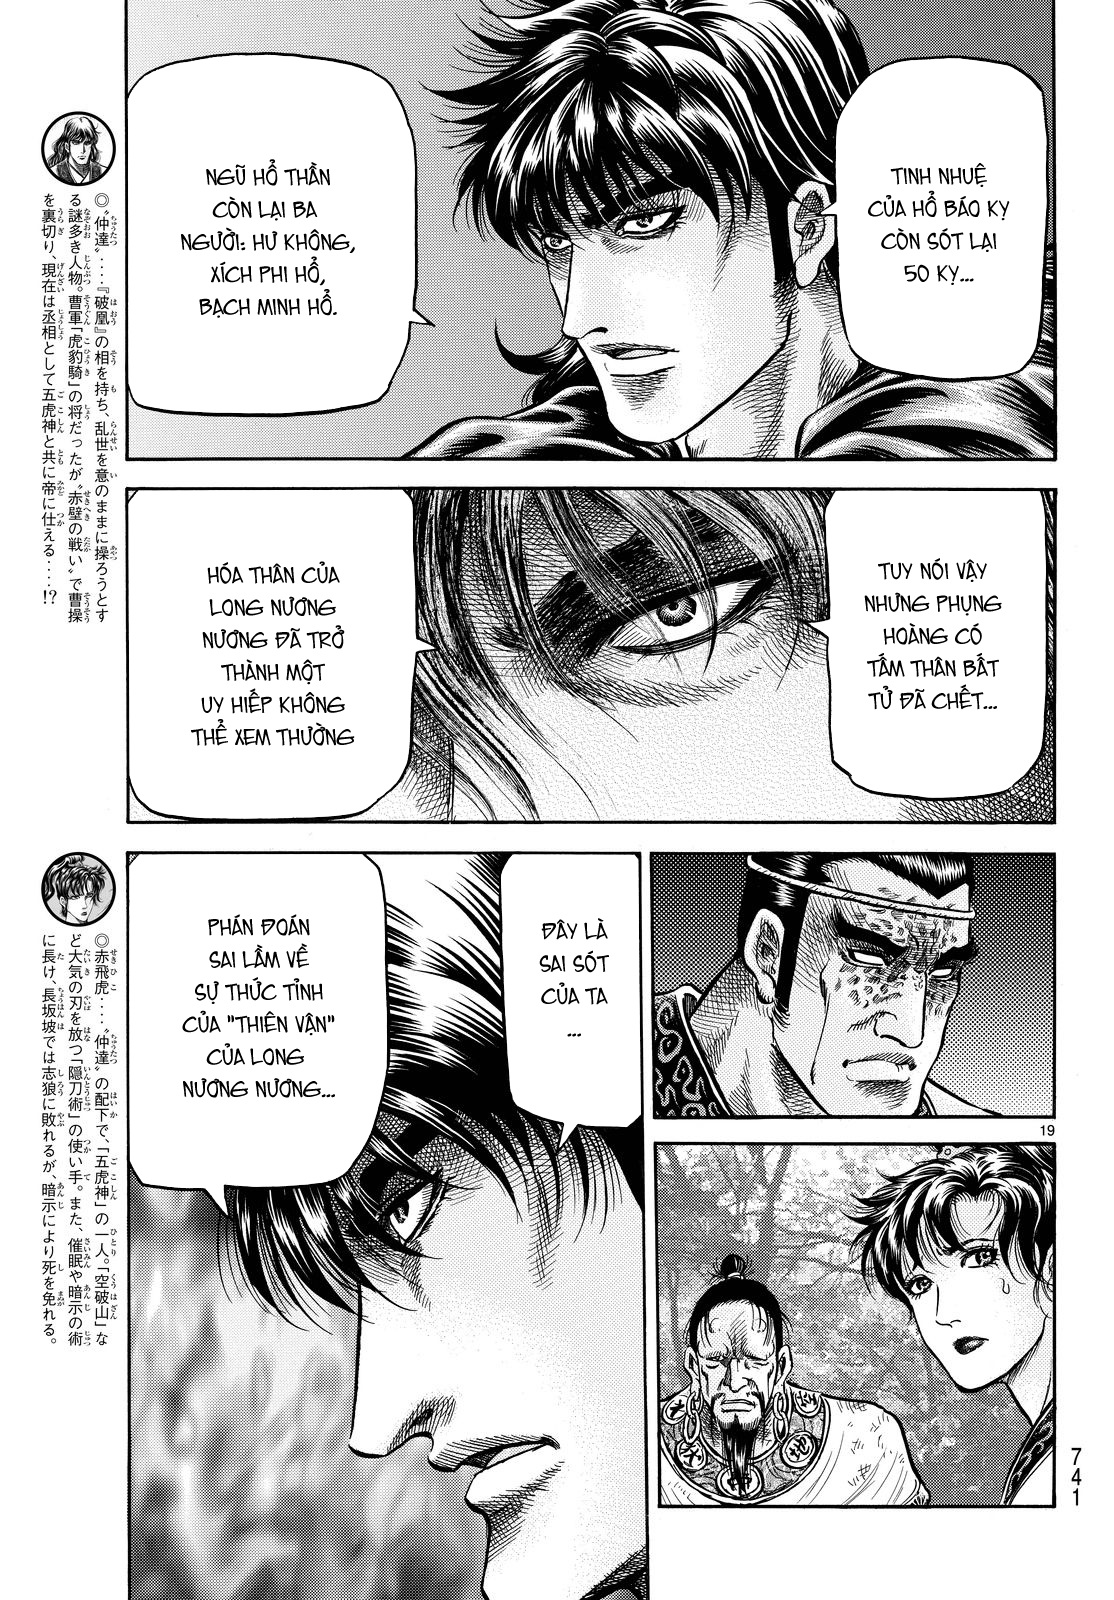 Ryuuroden chu be rong chap 265 trang 18 manga24h